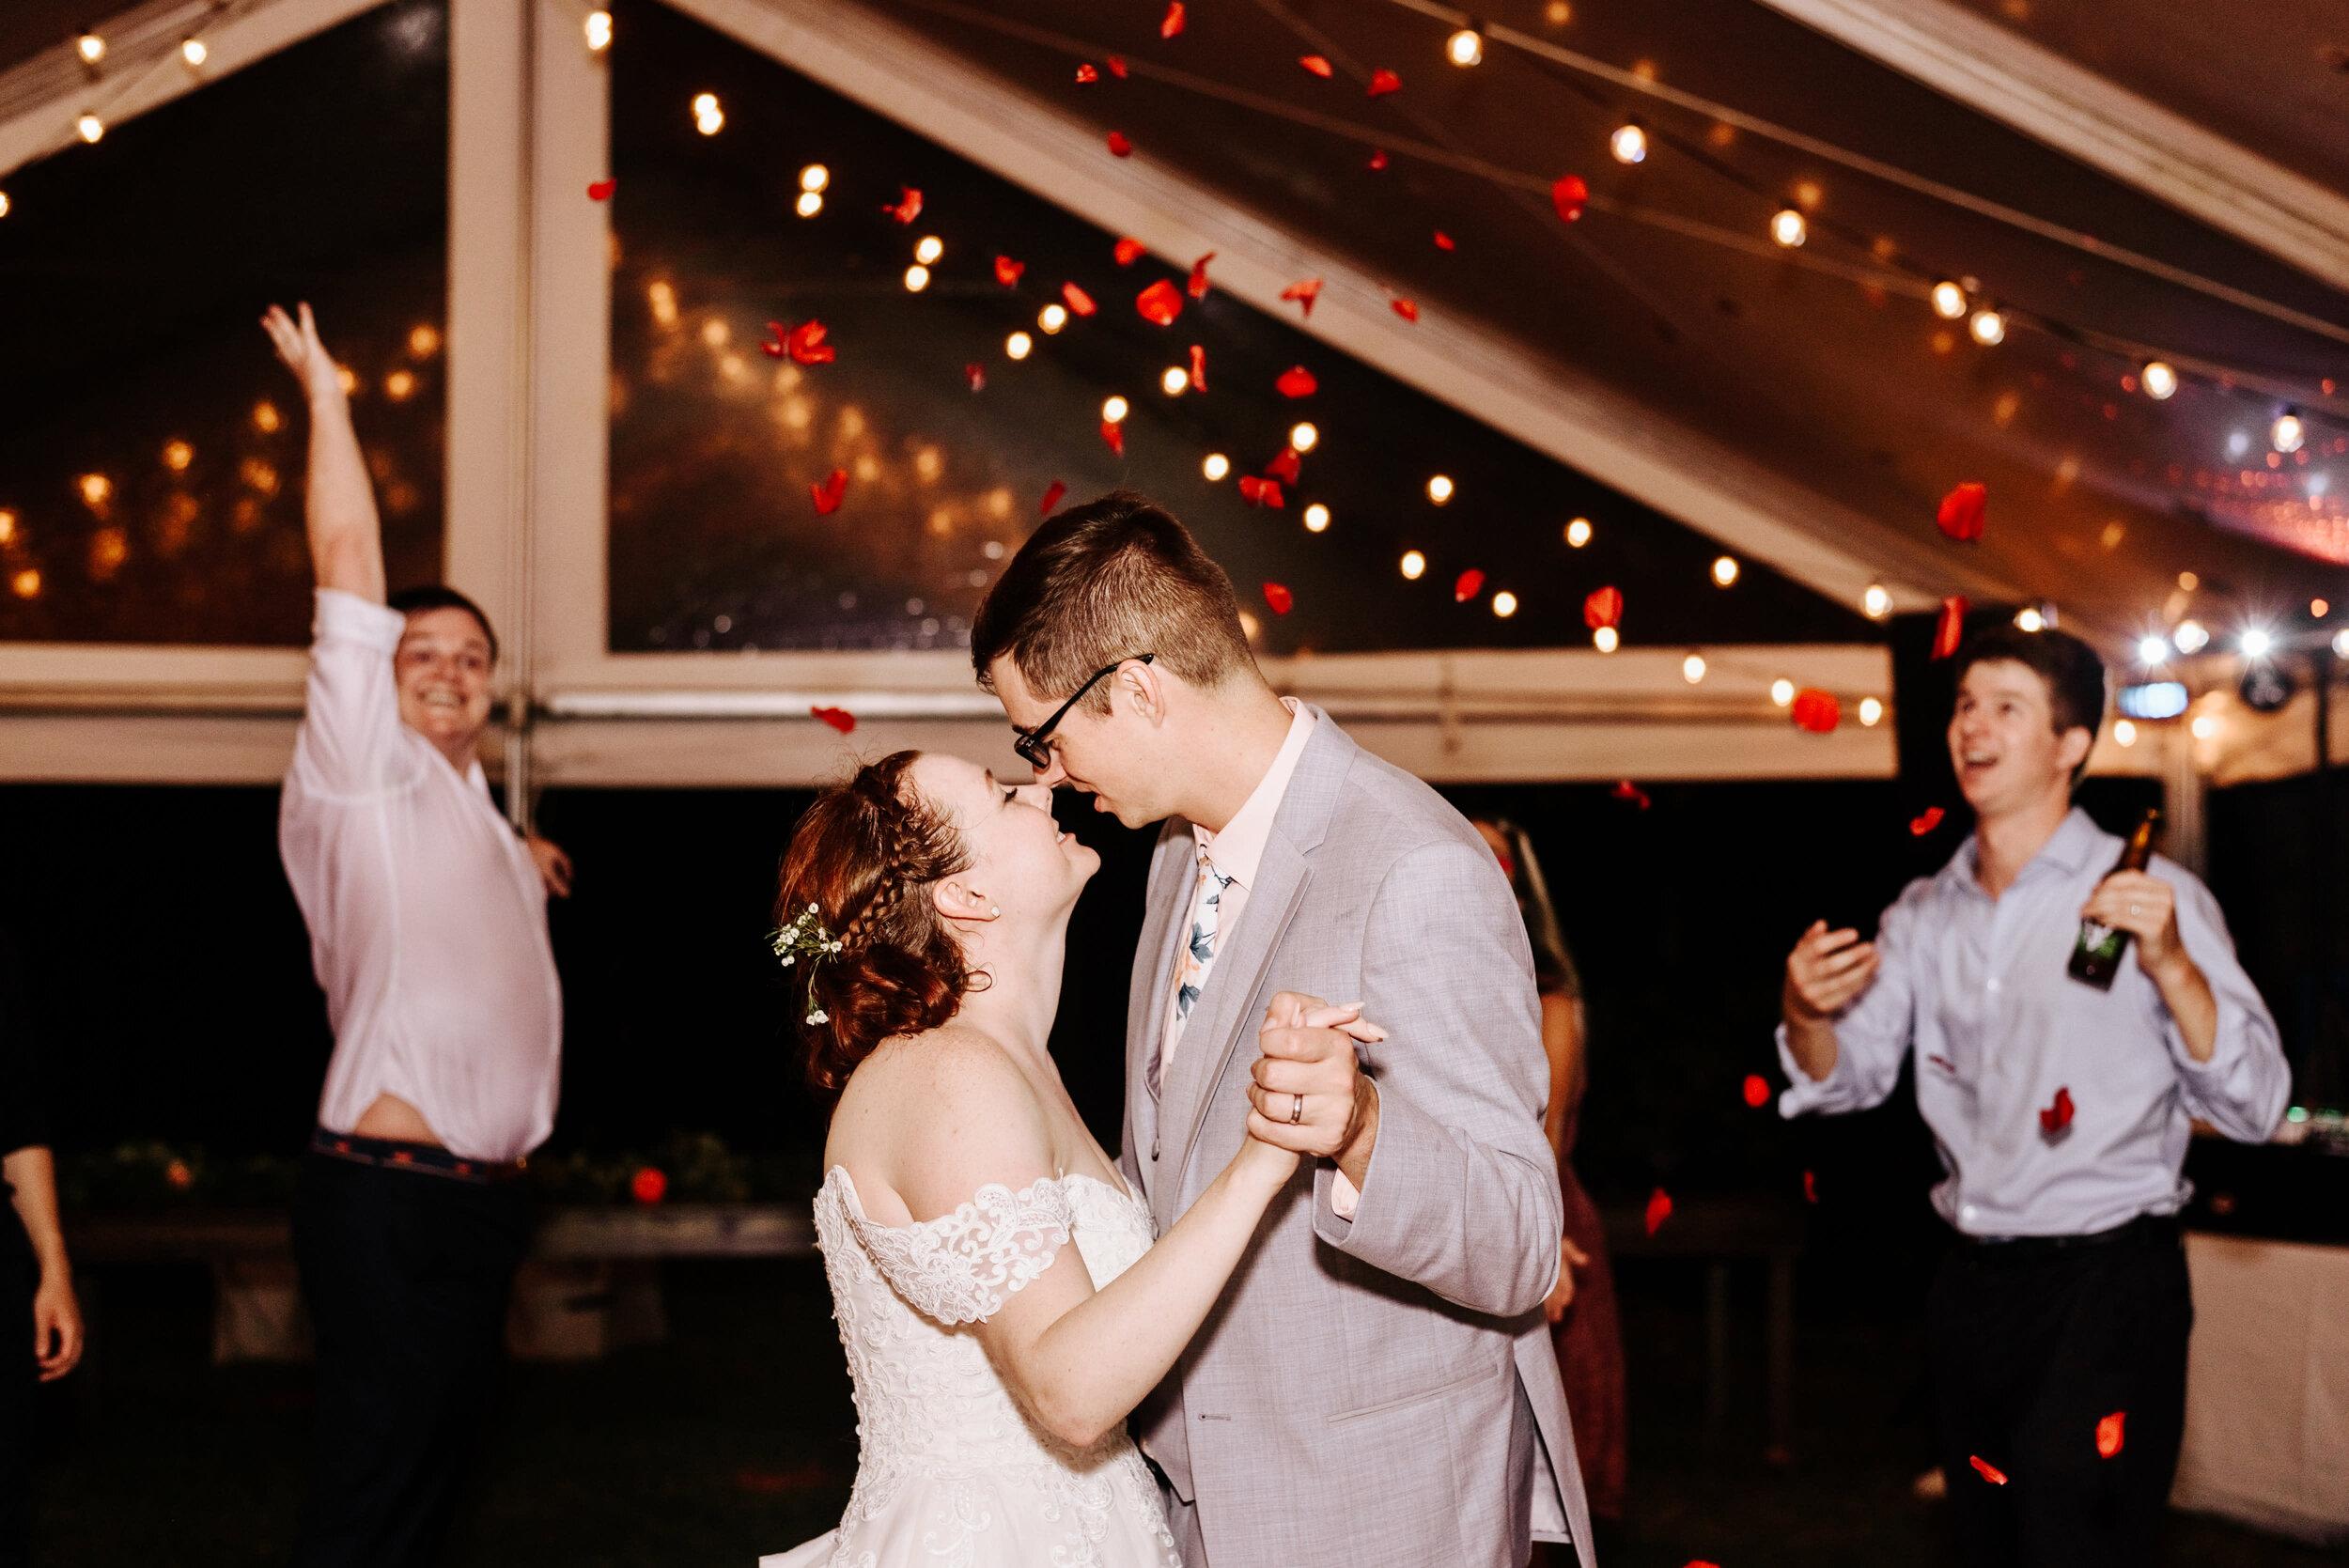 Rachel_David_Wedding_Richmond_Virginia_Photography_by_V_95.jpg